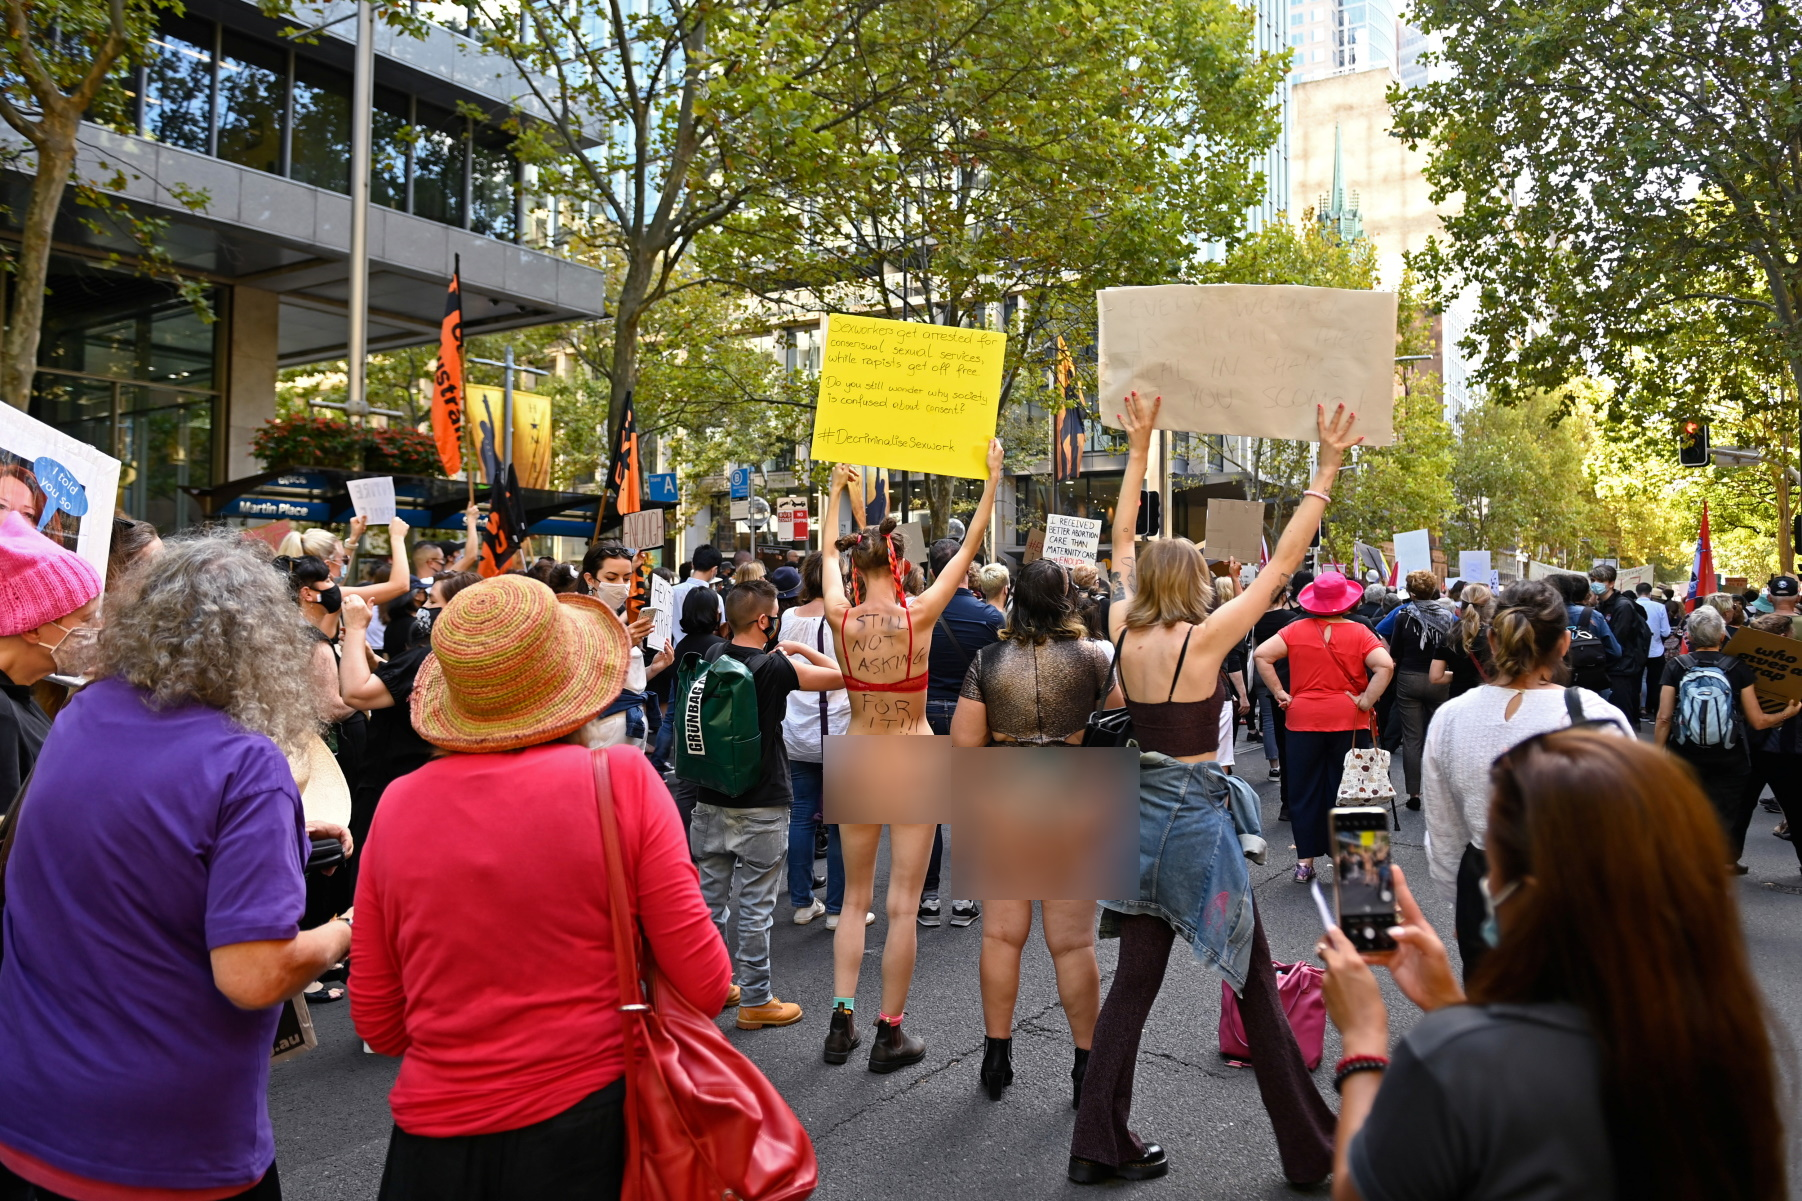 AUSTRALIA POLITICS RAPE 3 REUTERS 23 03 2021